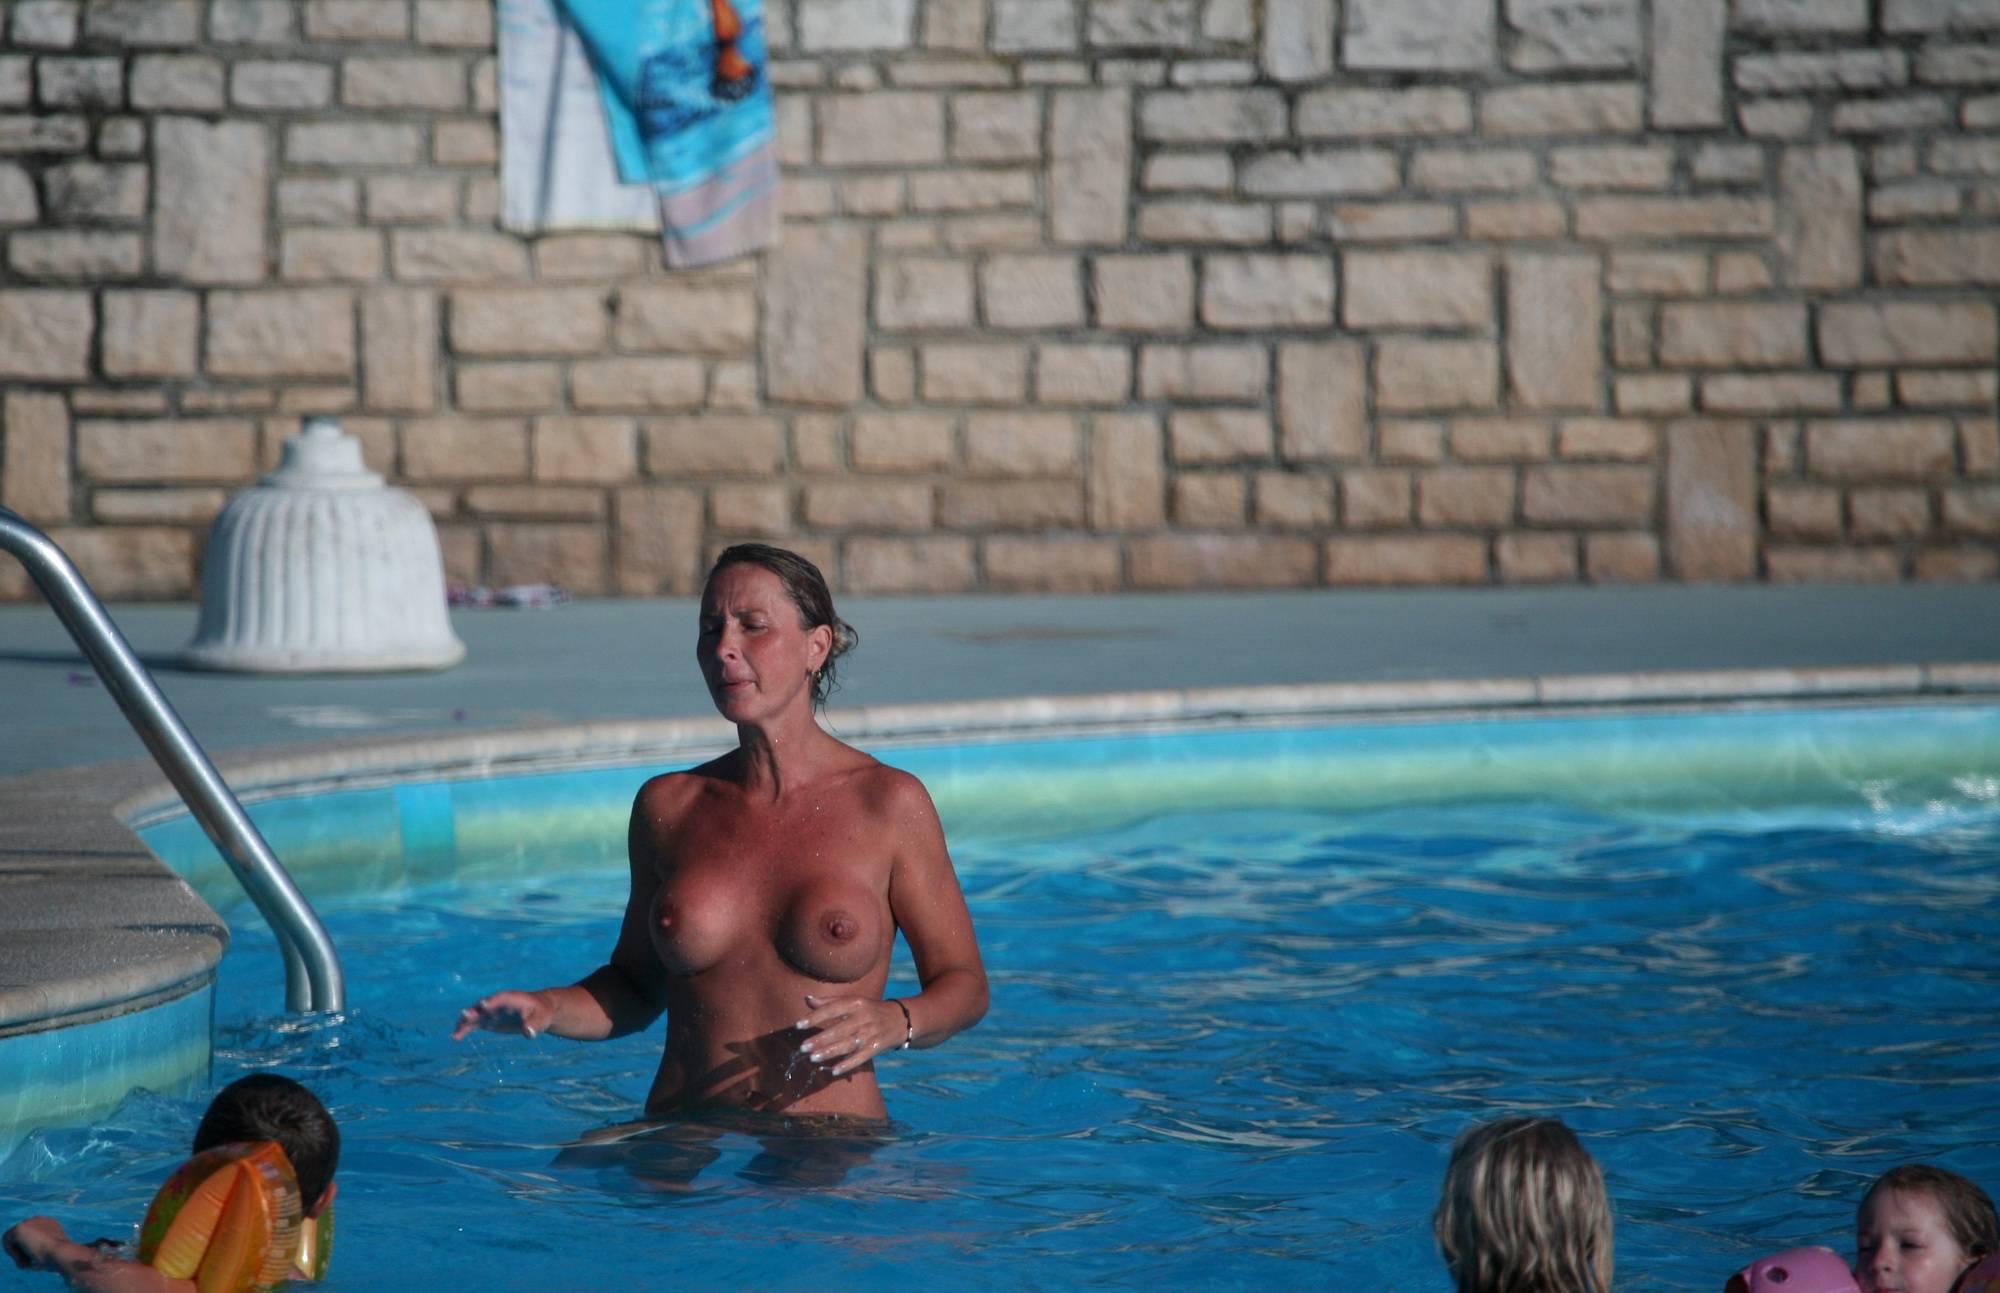 Nudist Gallery Inner Pool Nudist Activity - 2